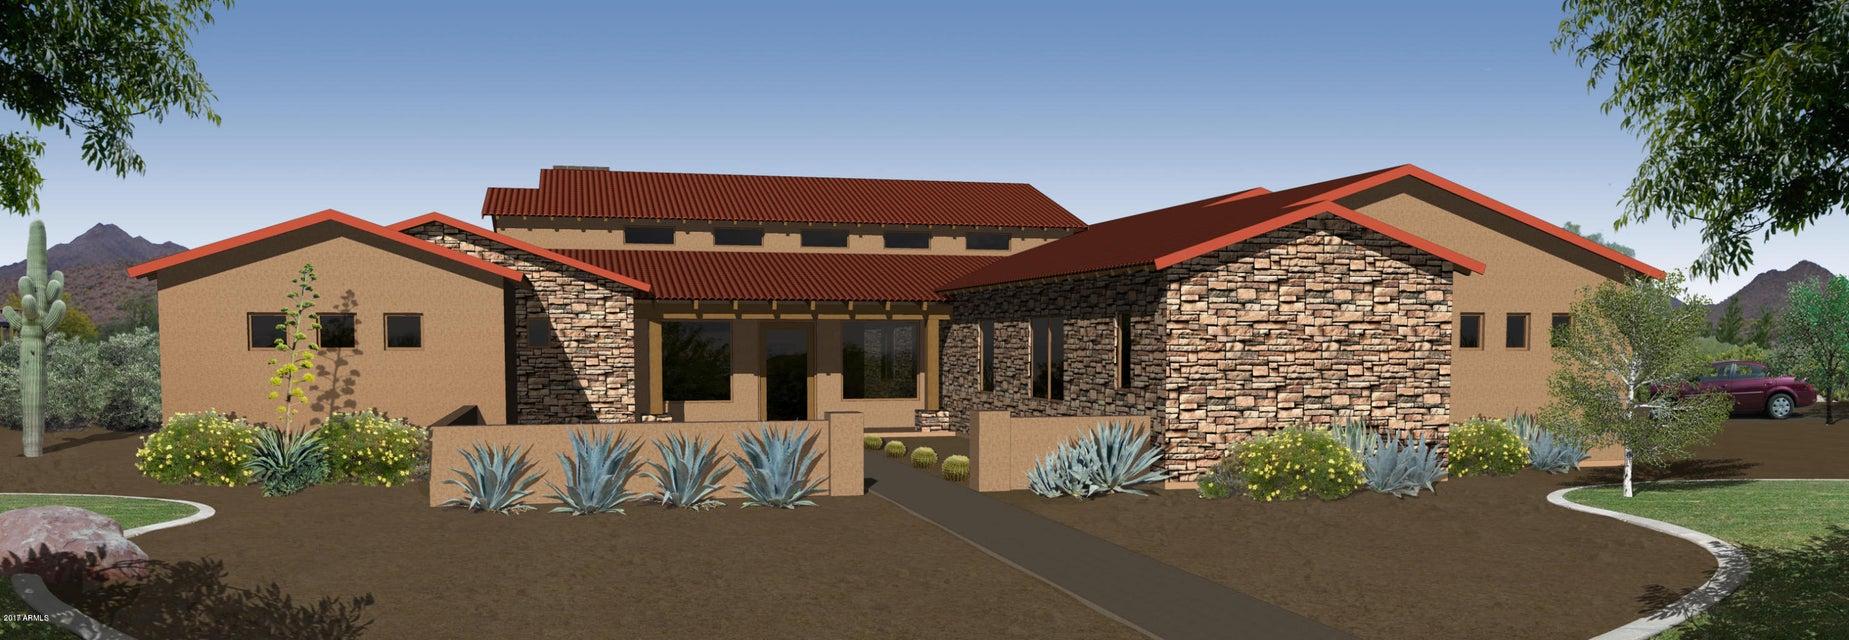 36000 N 51st Place Cave Creek, AZ 85331 - MLS #: 5634115